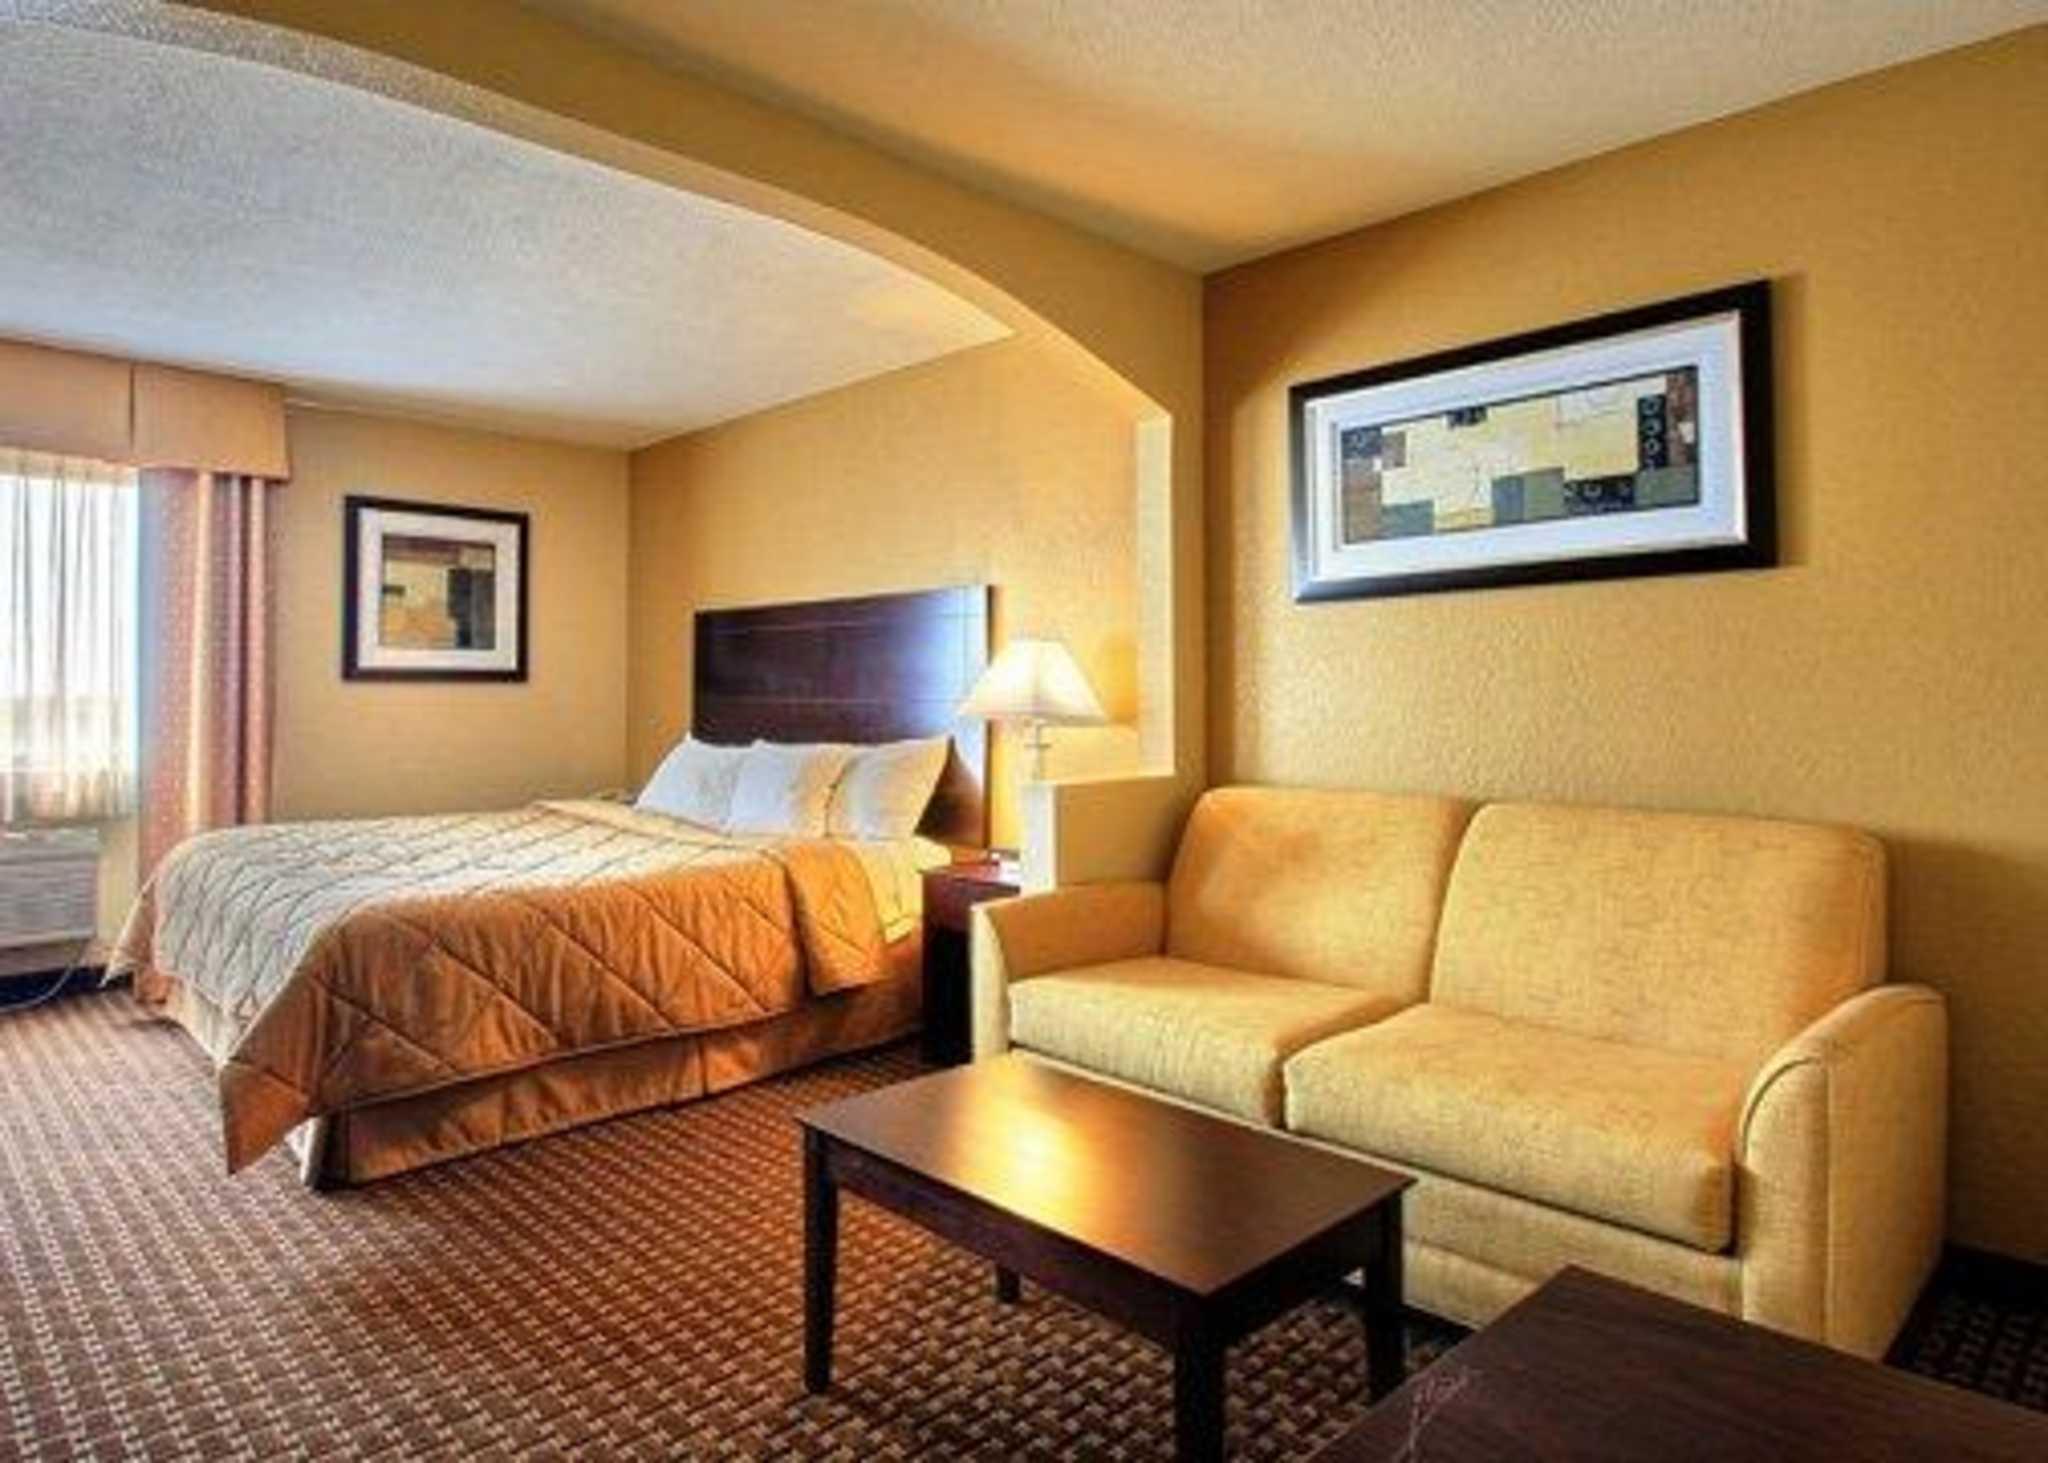 Quality Inn in Des Moines, IA, photo #10